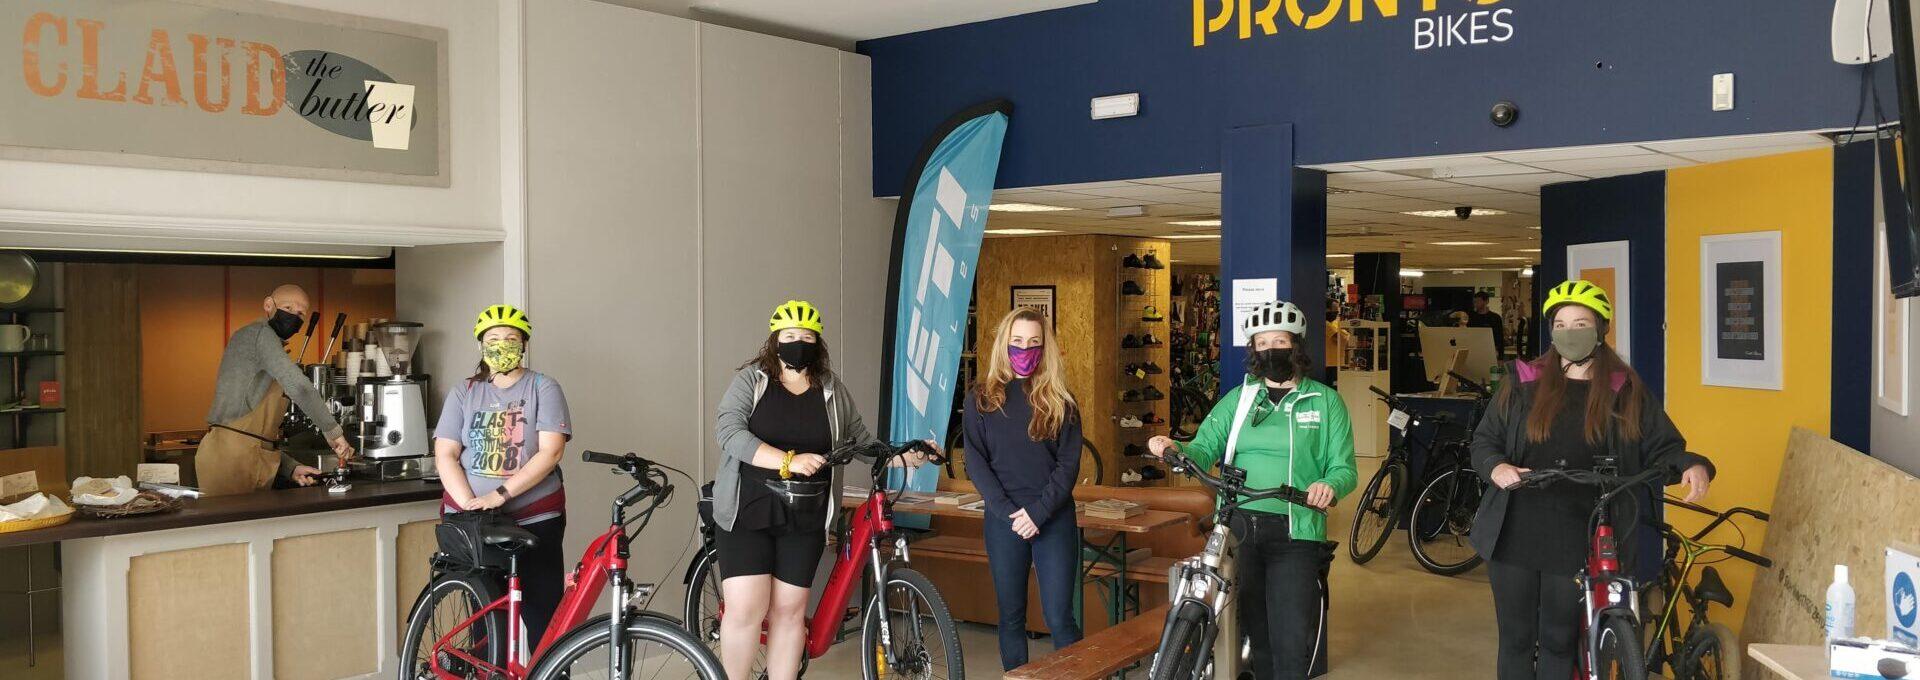 Ladies with bikes at Pronto bikes